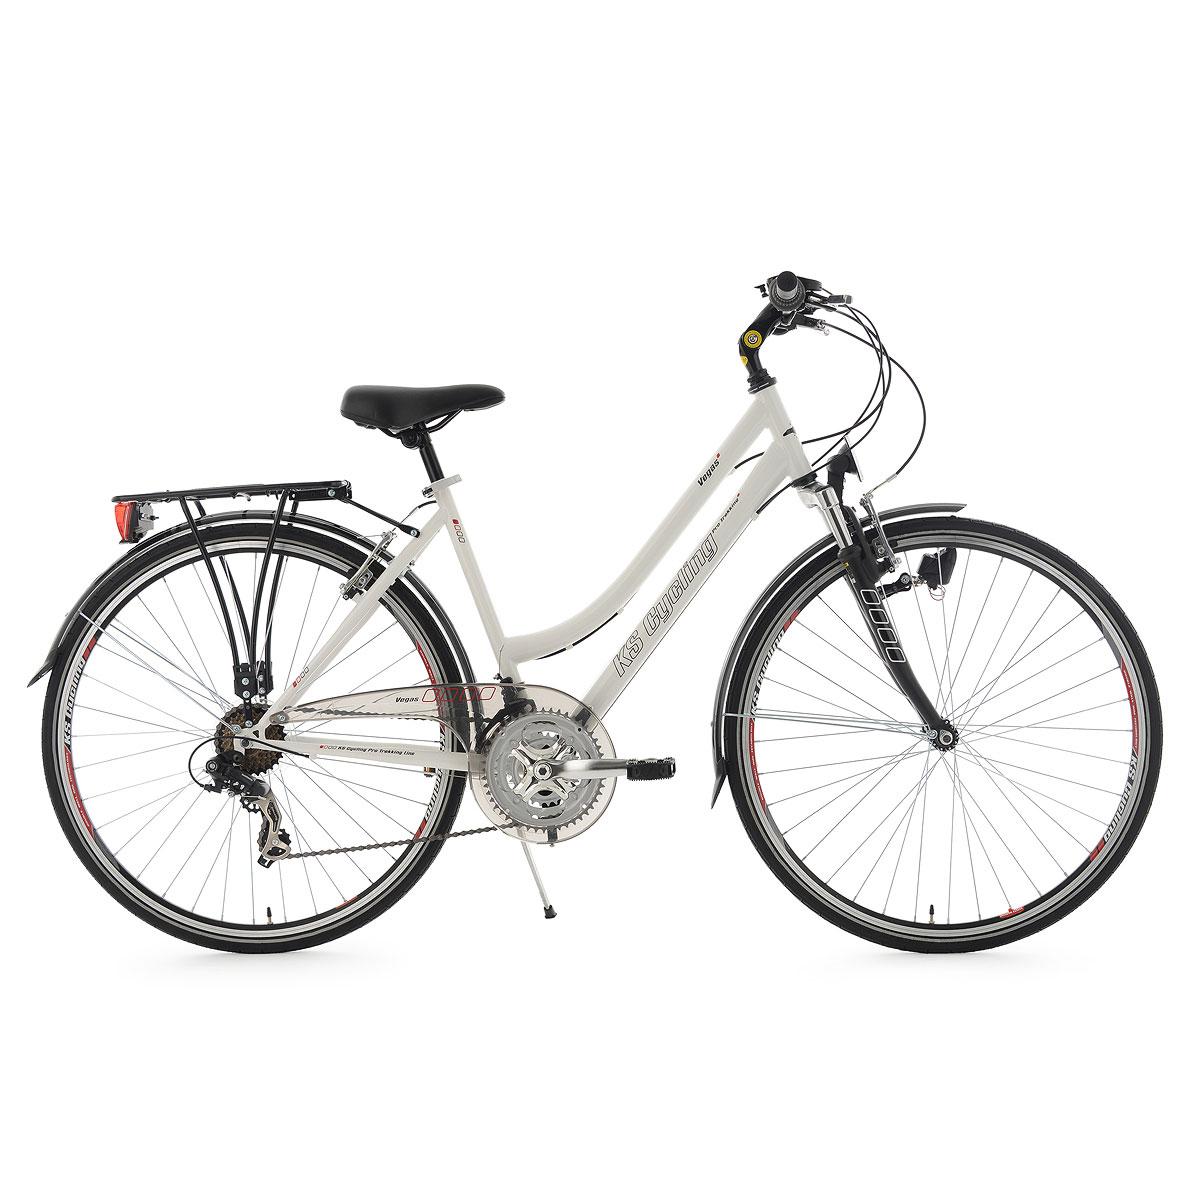 "Trekkingrad ""Vegas"", Damen, Flachlenker, 53cm, weiß Flachlenker | Damen | weiß | 53 cm"